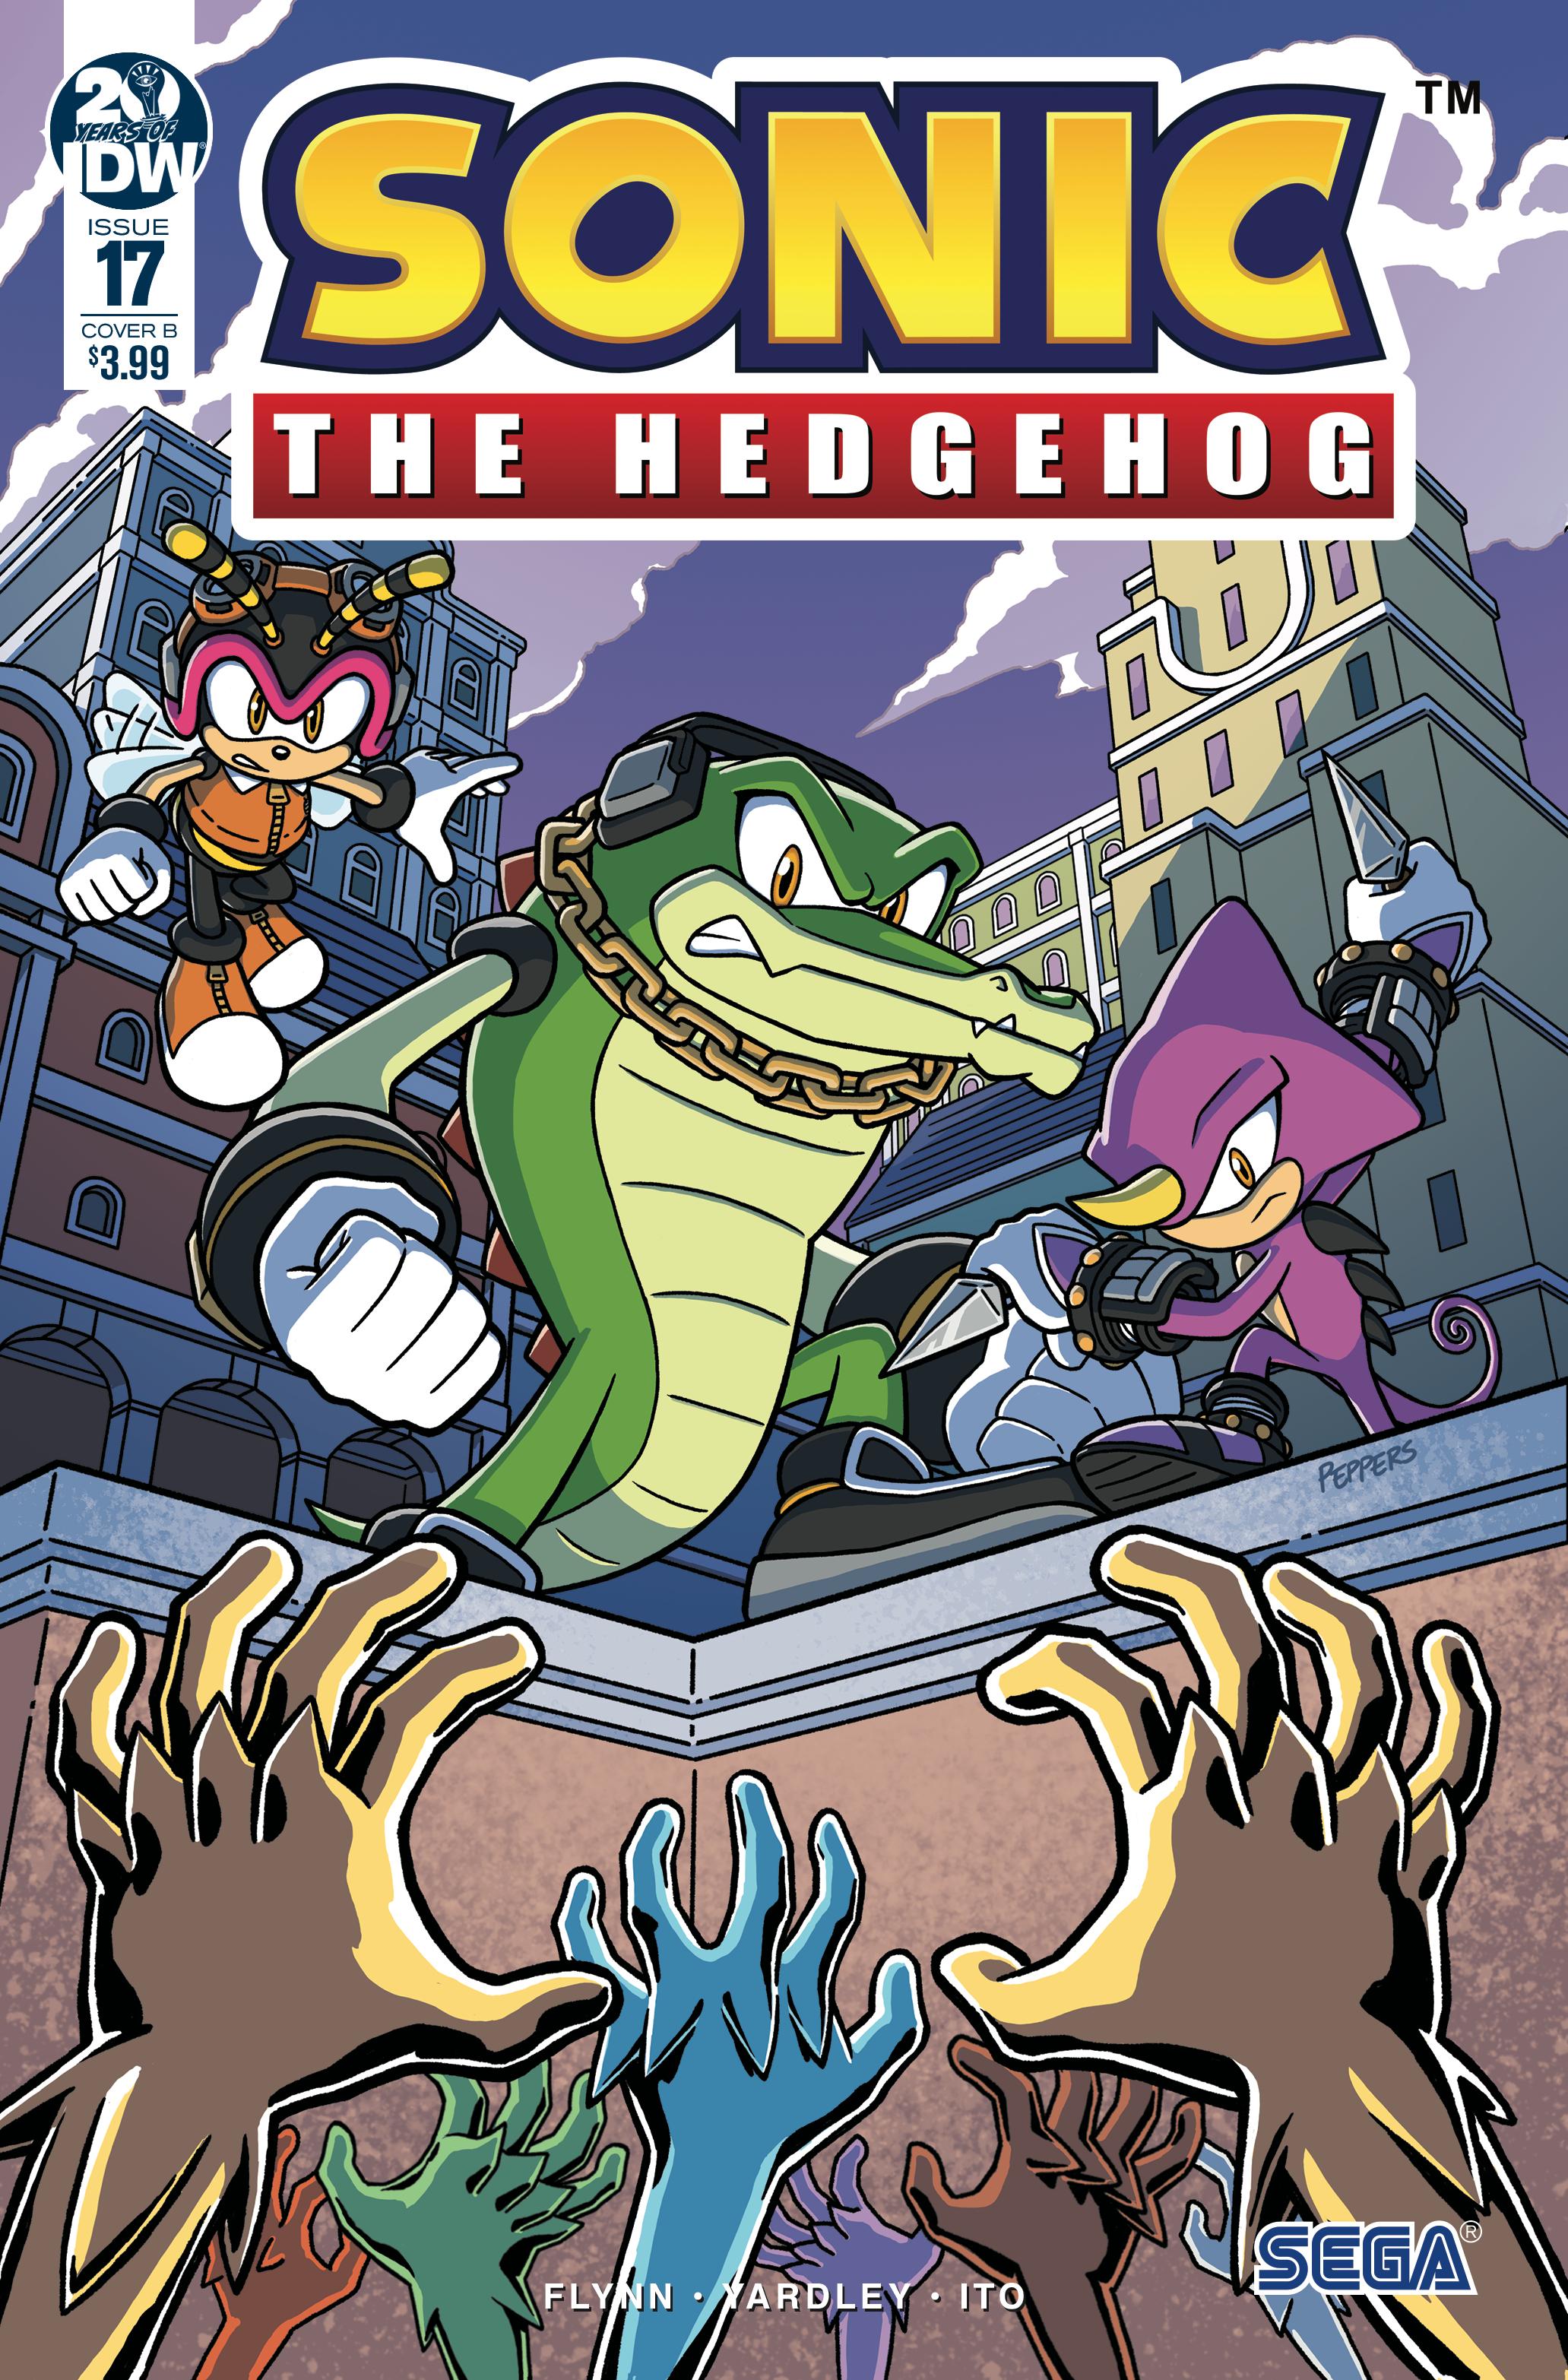 Idw Sonic The Hedgehog Issue 17 Sonic News Network Fandom